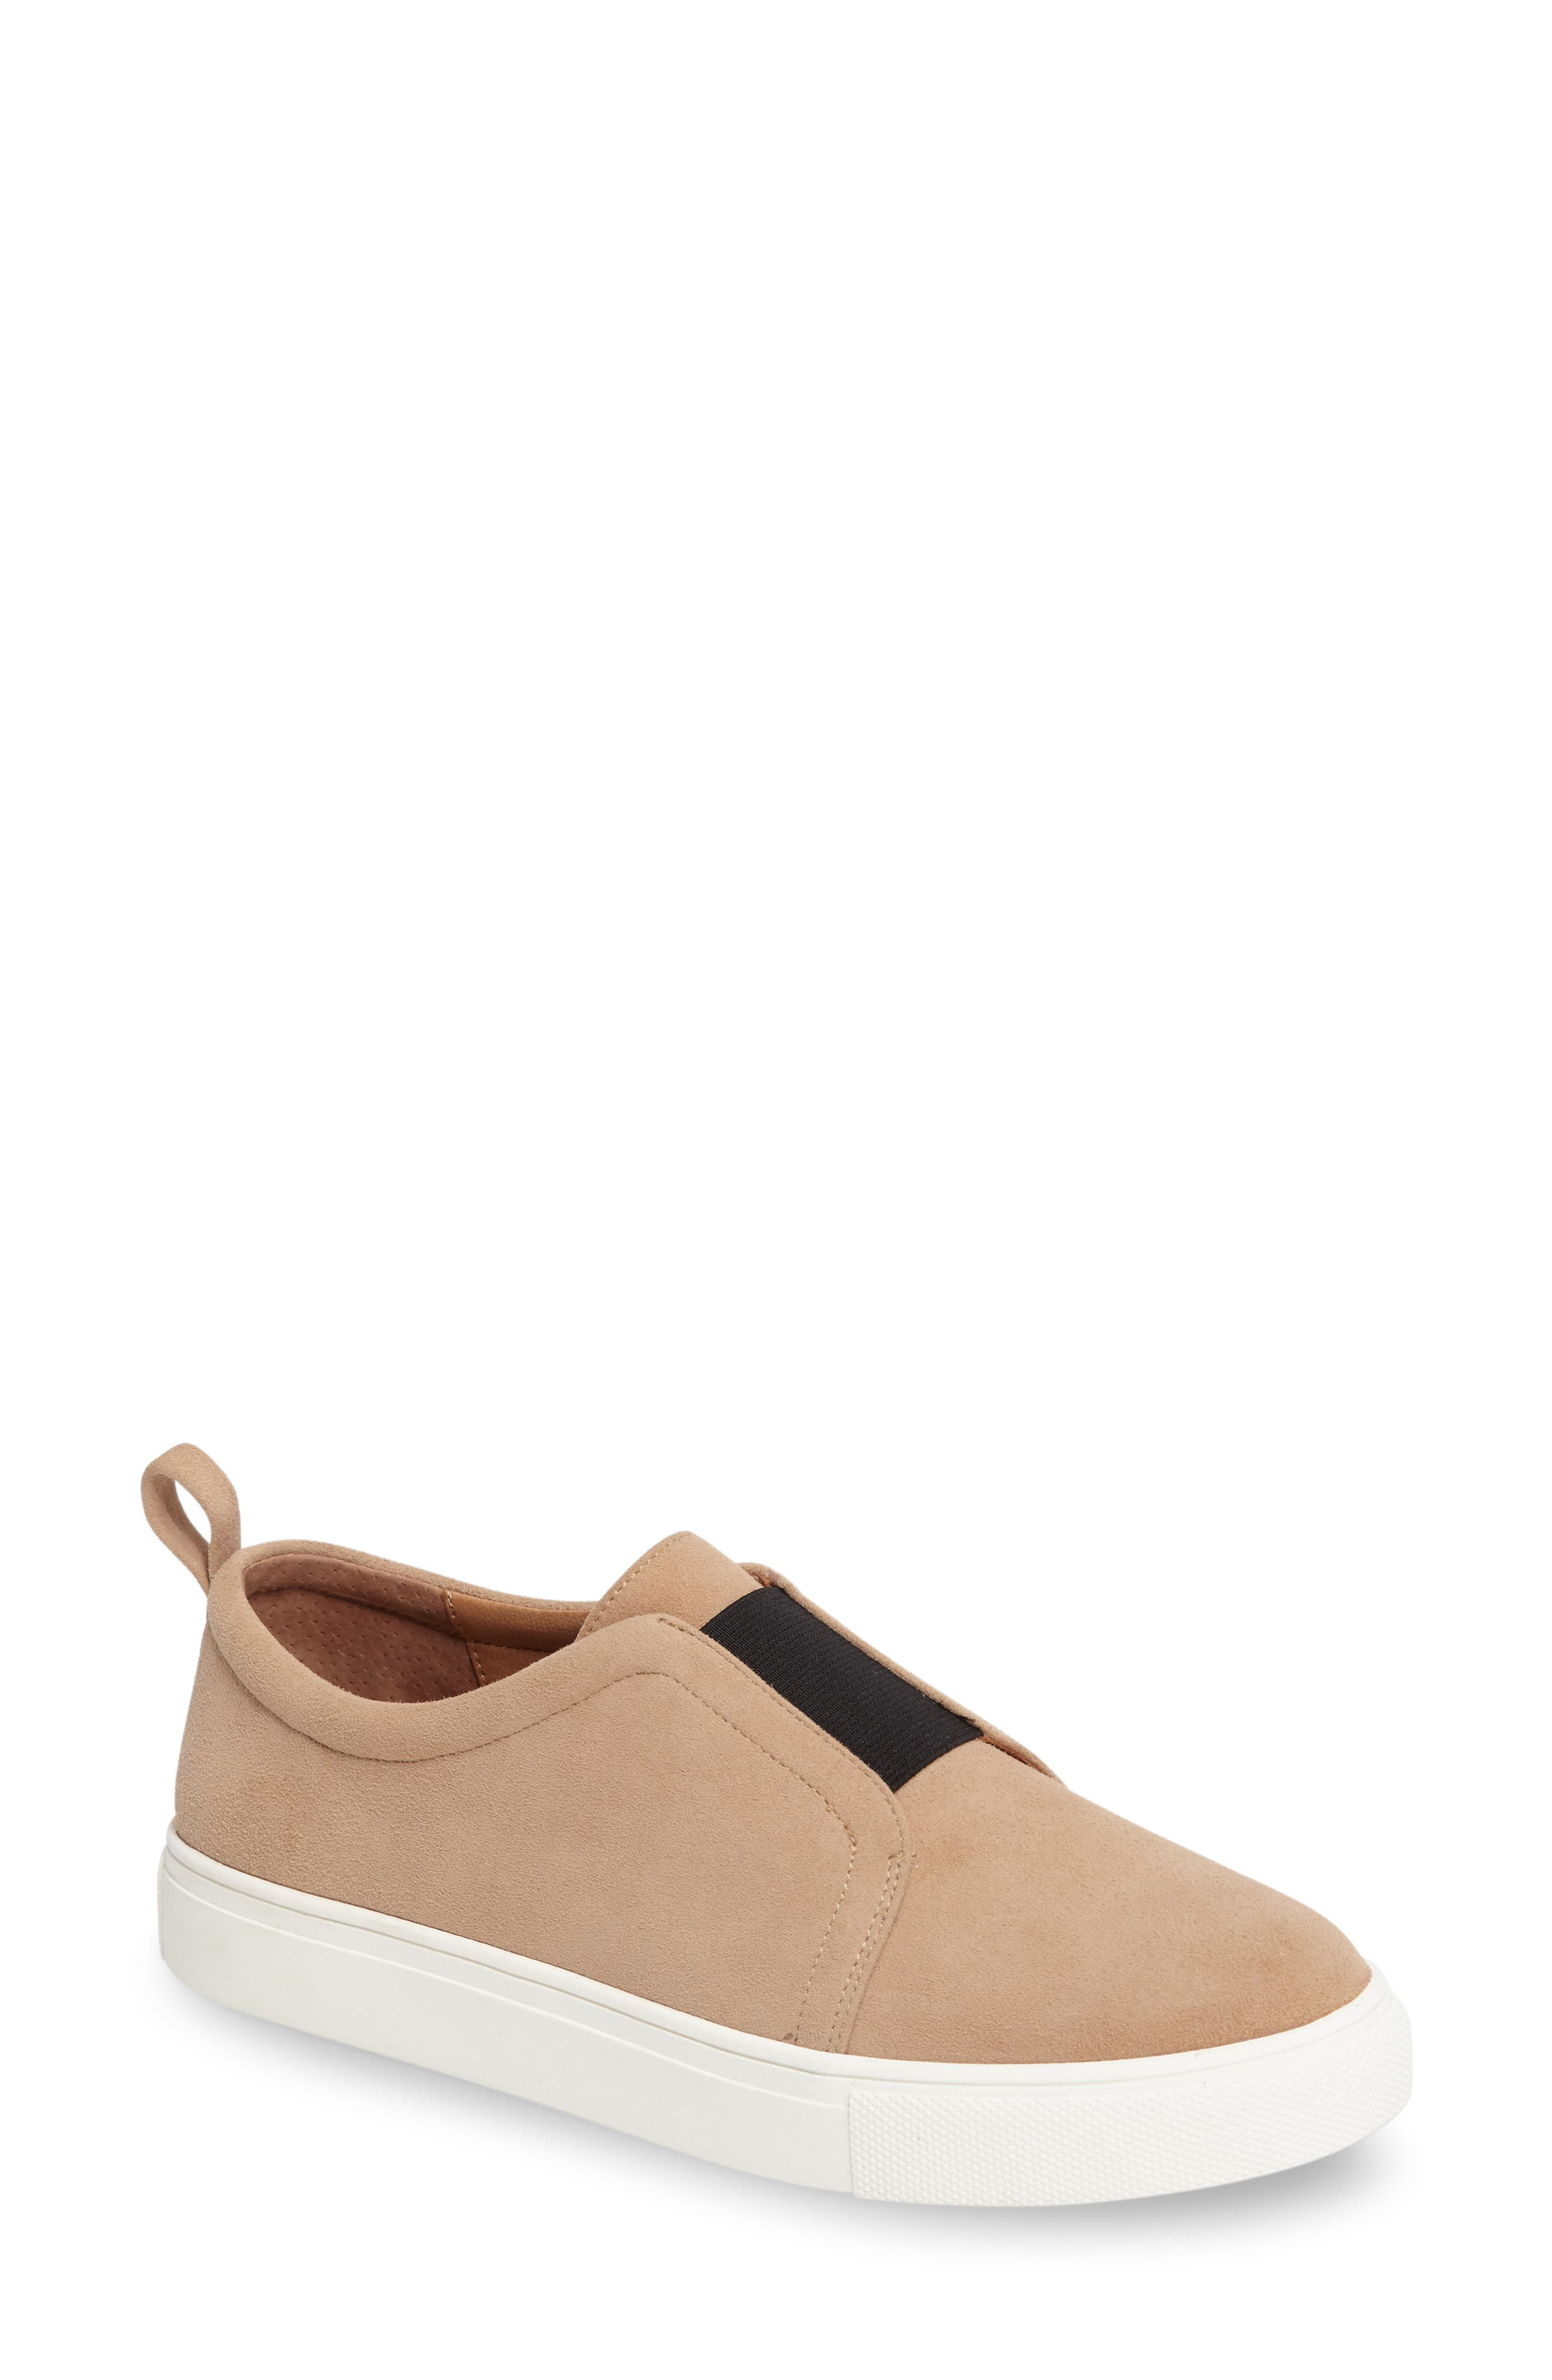 Kyle Slip-On Sneaker,                         Main,                         color, Caramel Suede